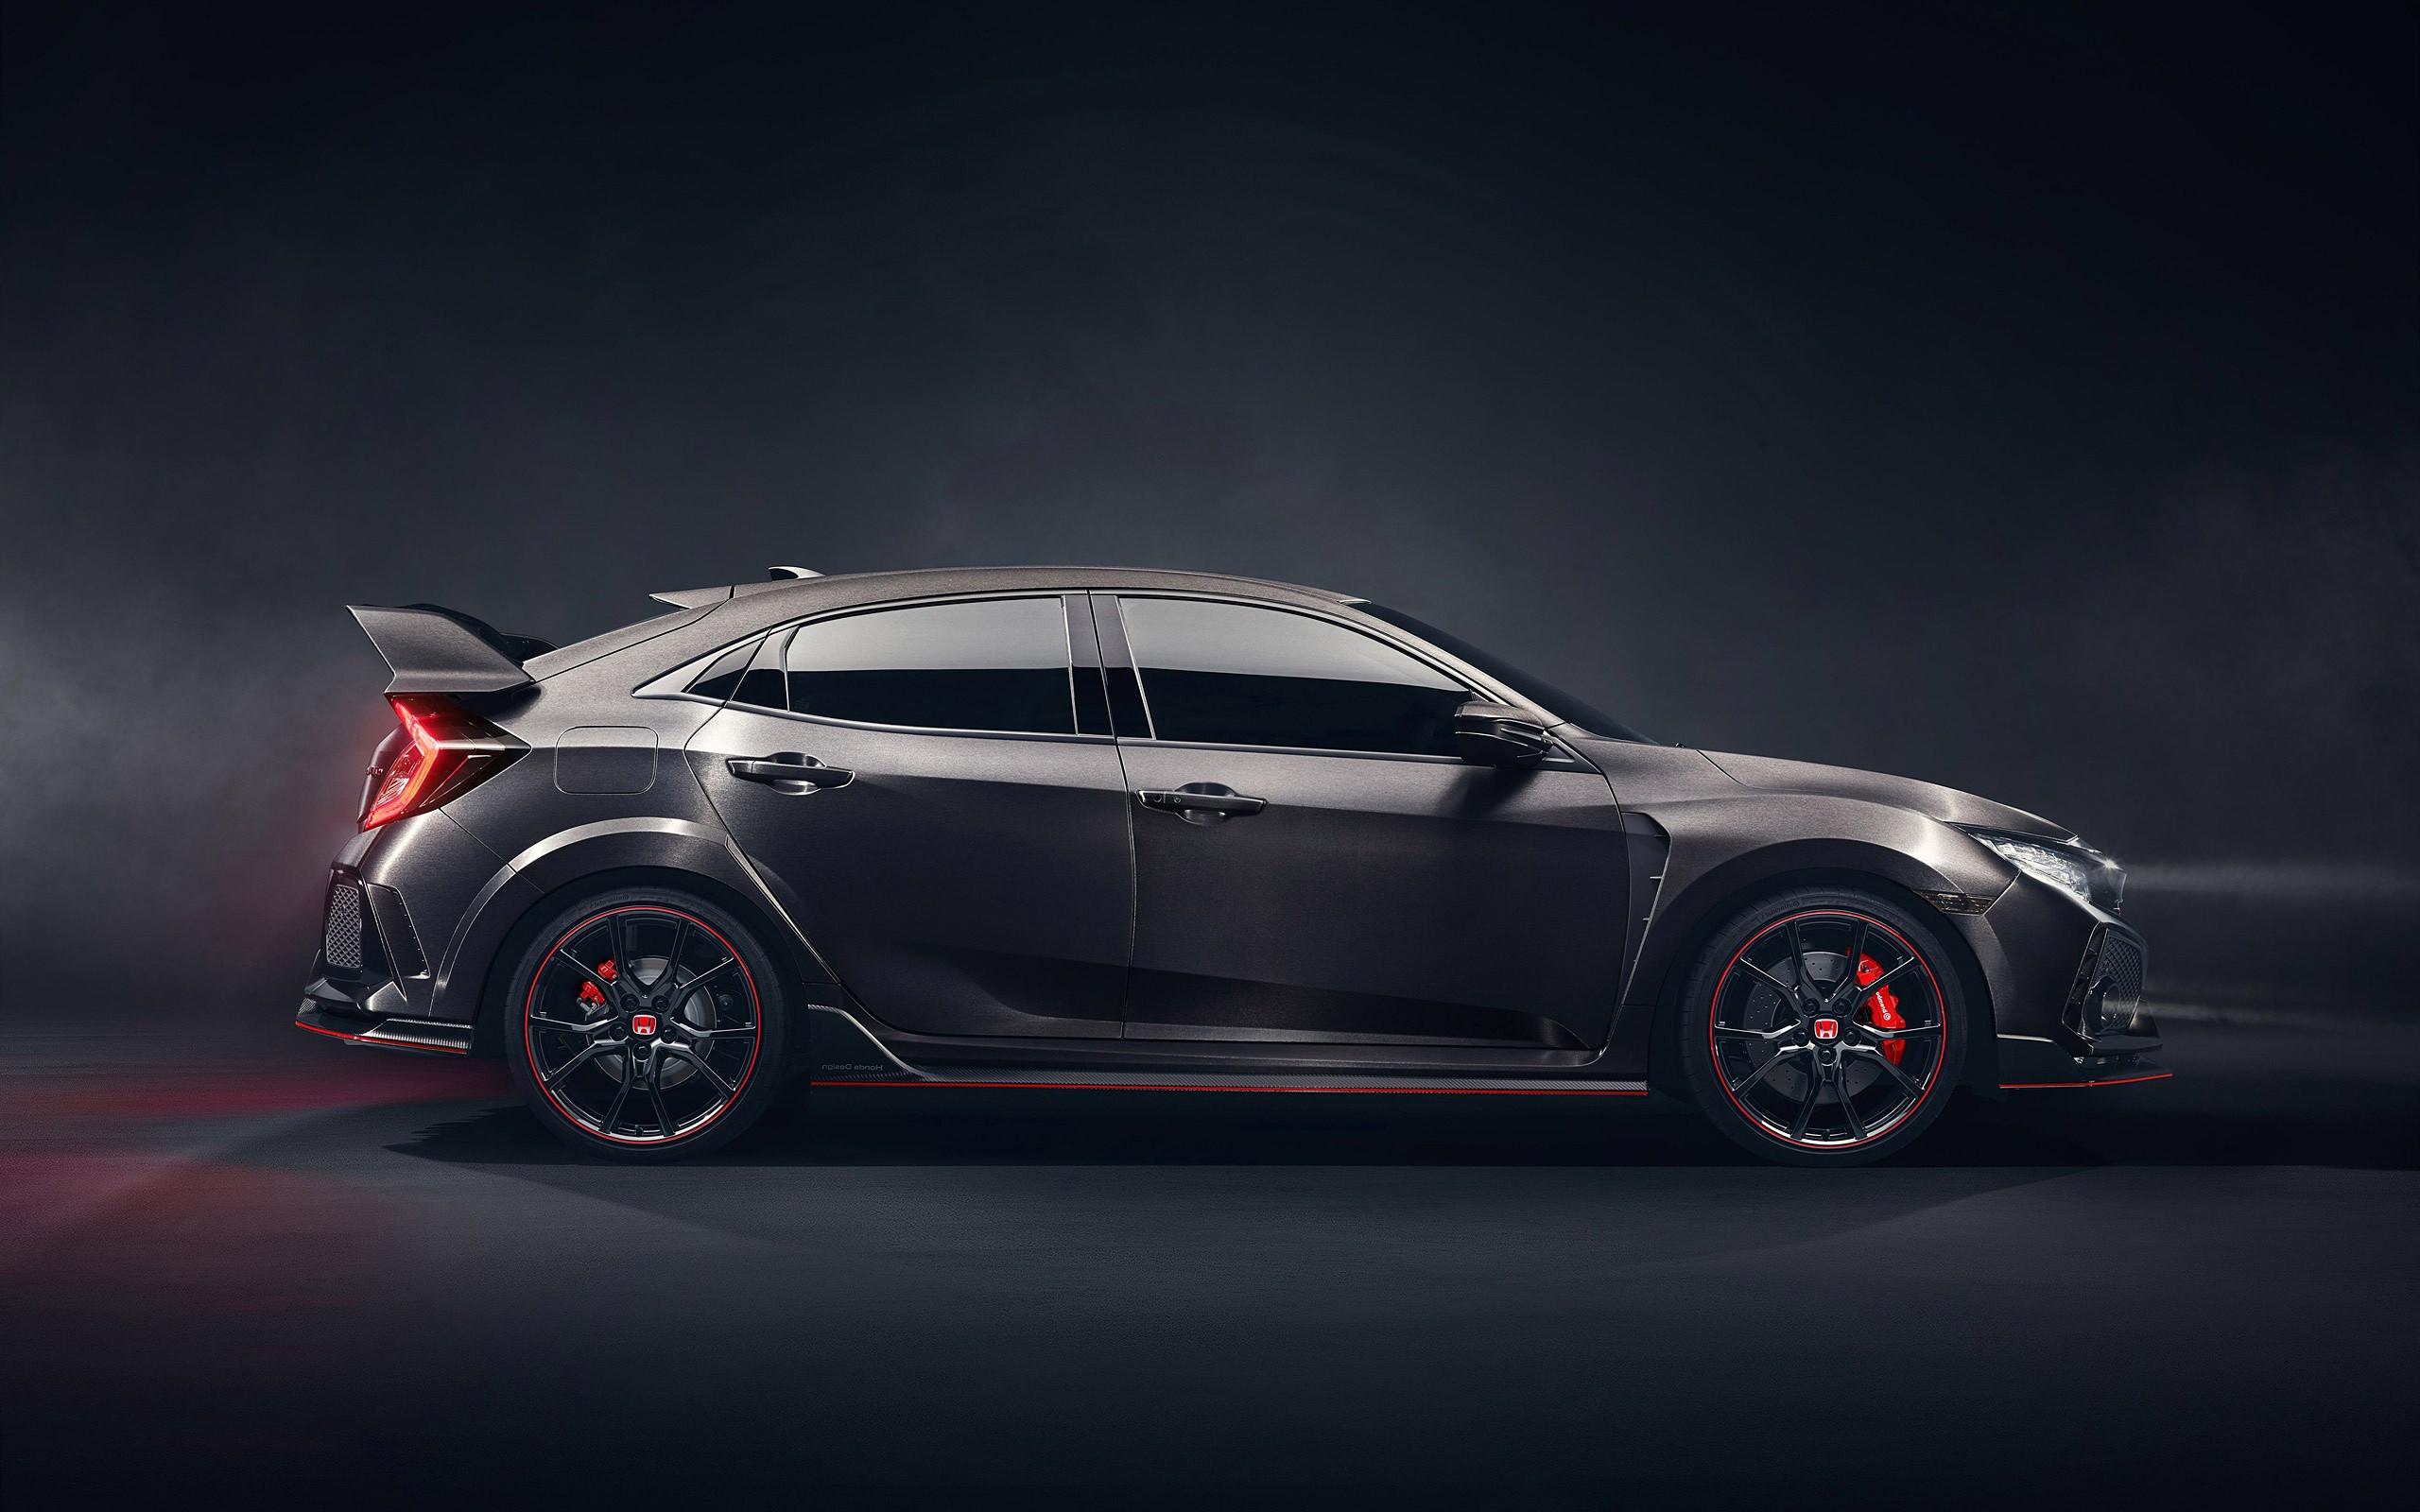 Honda Civic Type R Car 2016   New HD Wallpapers 2560x1600